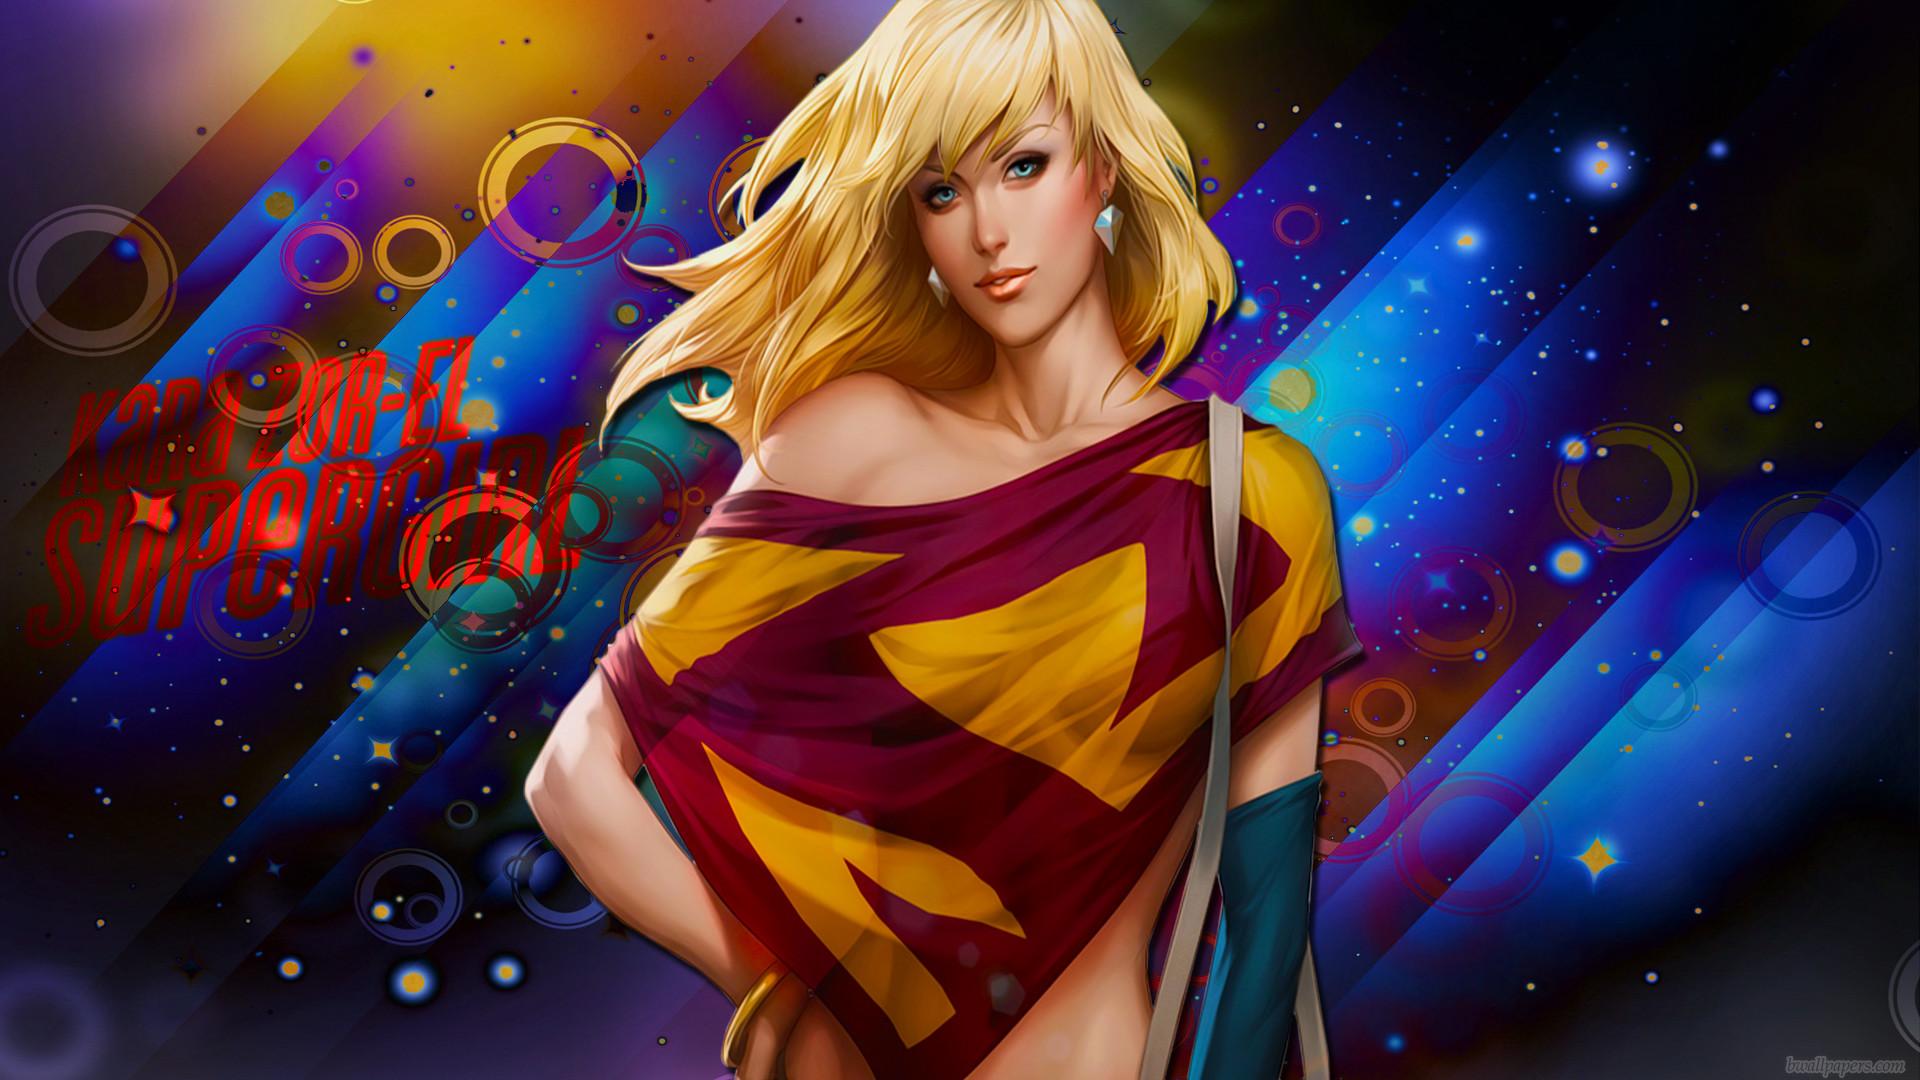 Sexy Superhero Wallpaper - WallpaperSafari